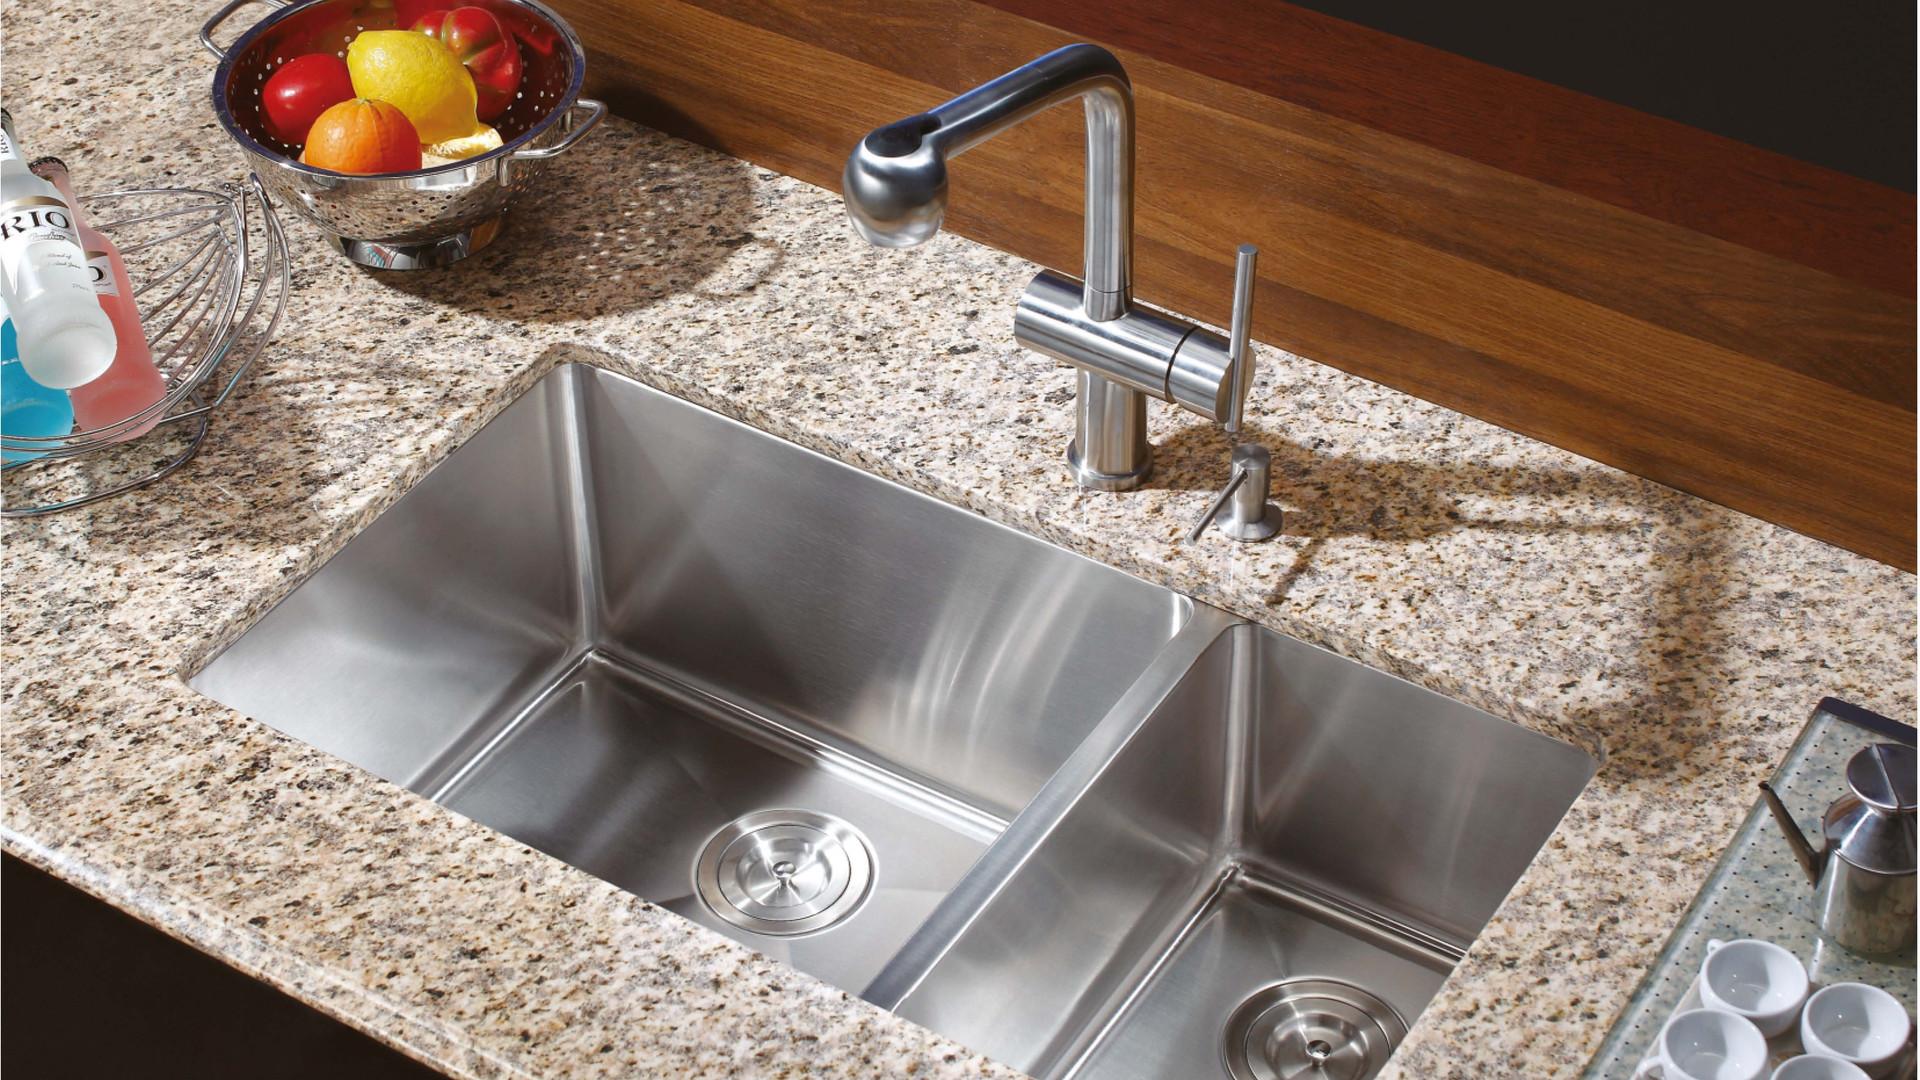 ASAPstainless sink2.jpg